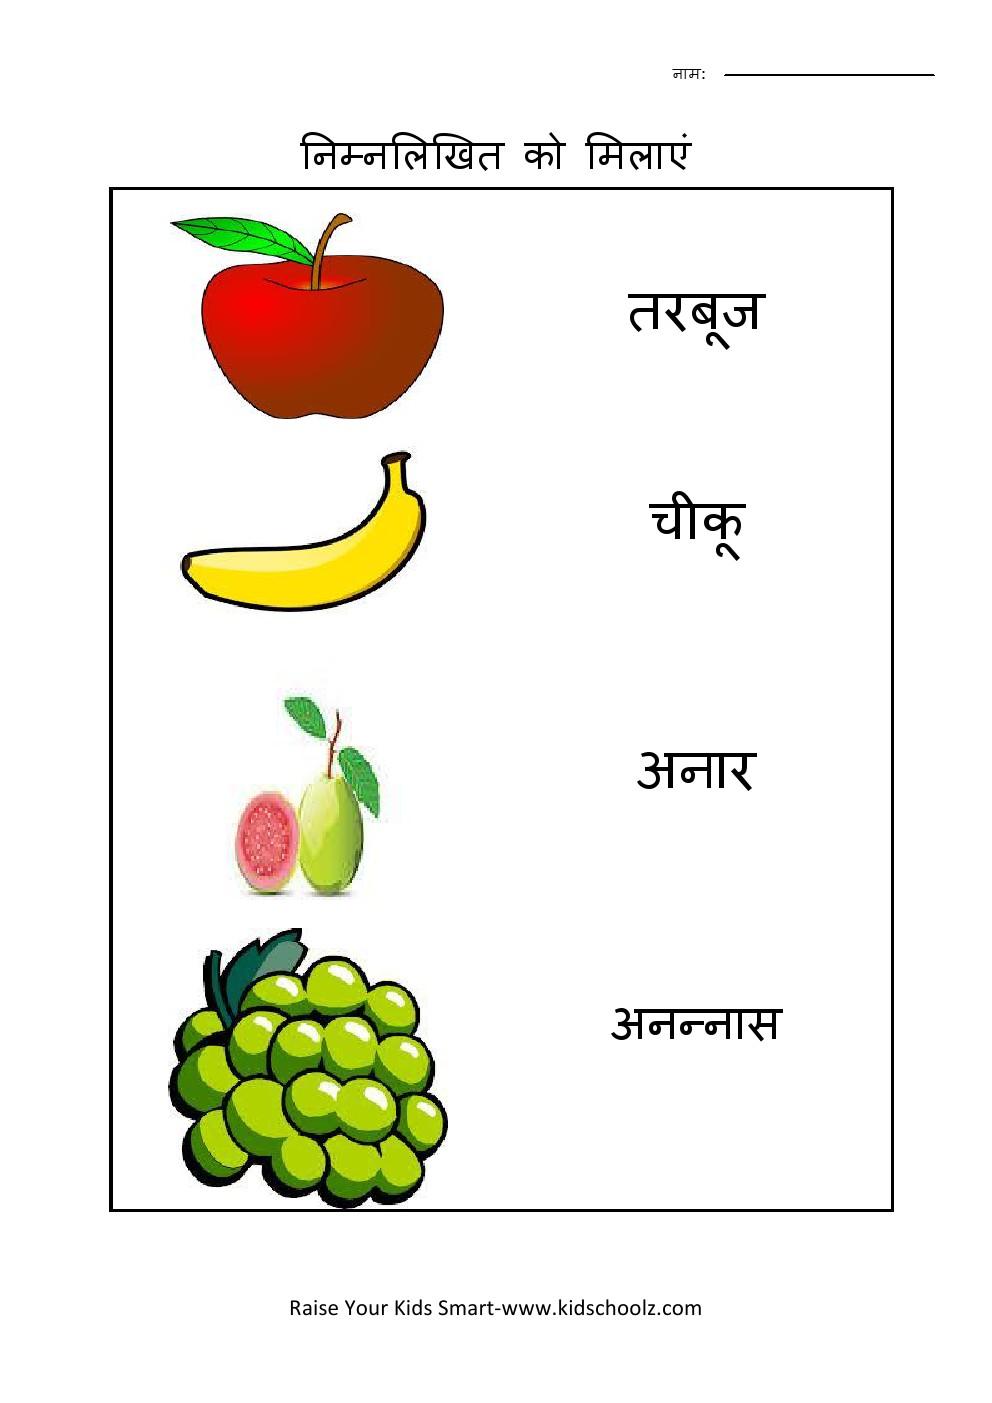 Workbooks hindi worksheets for ukg students : Hindi- Fruits Worksheet 2 - Kidschoolz